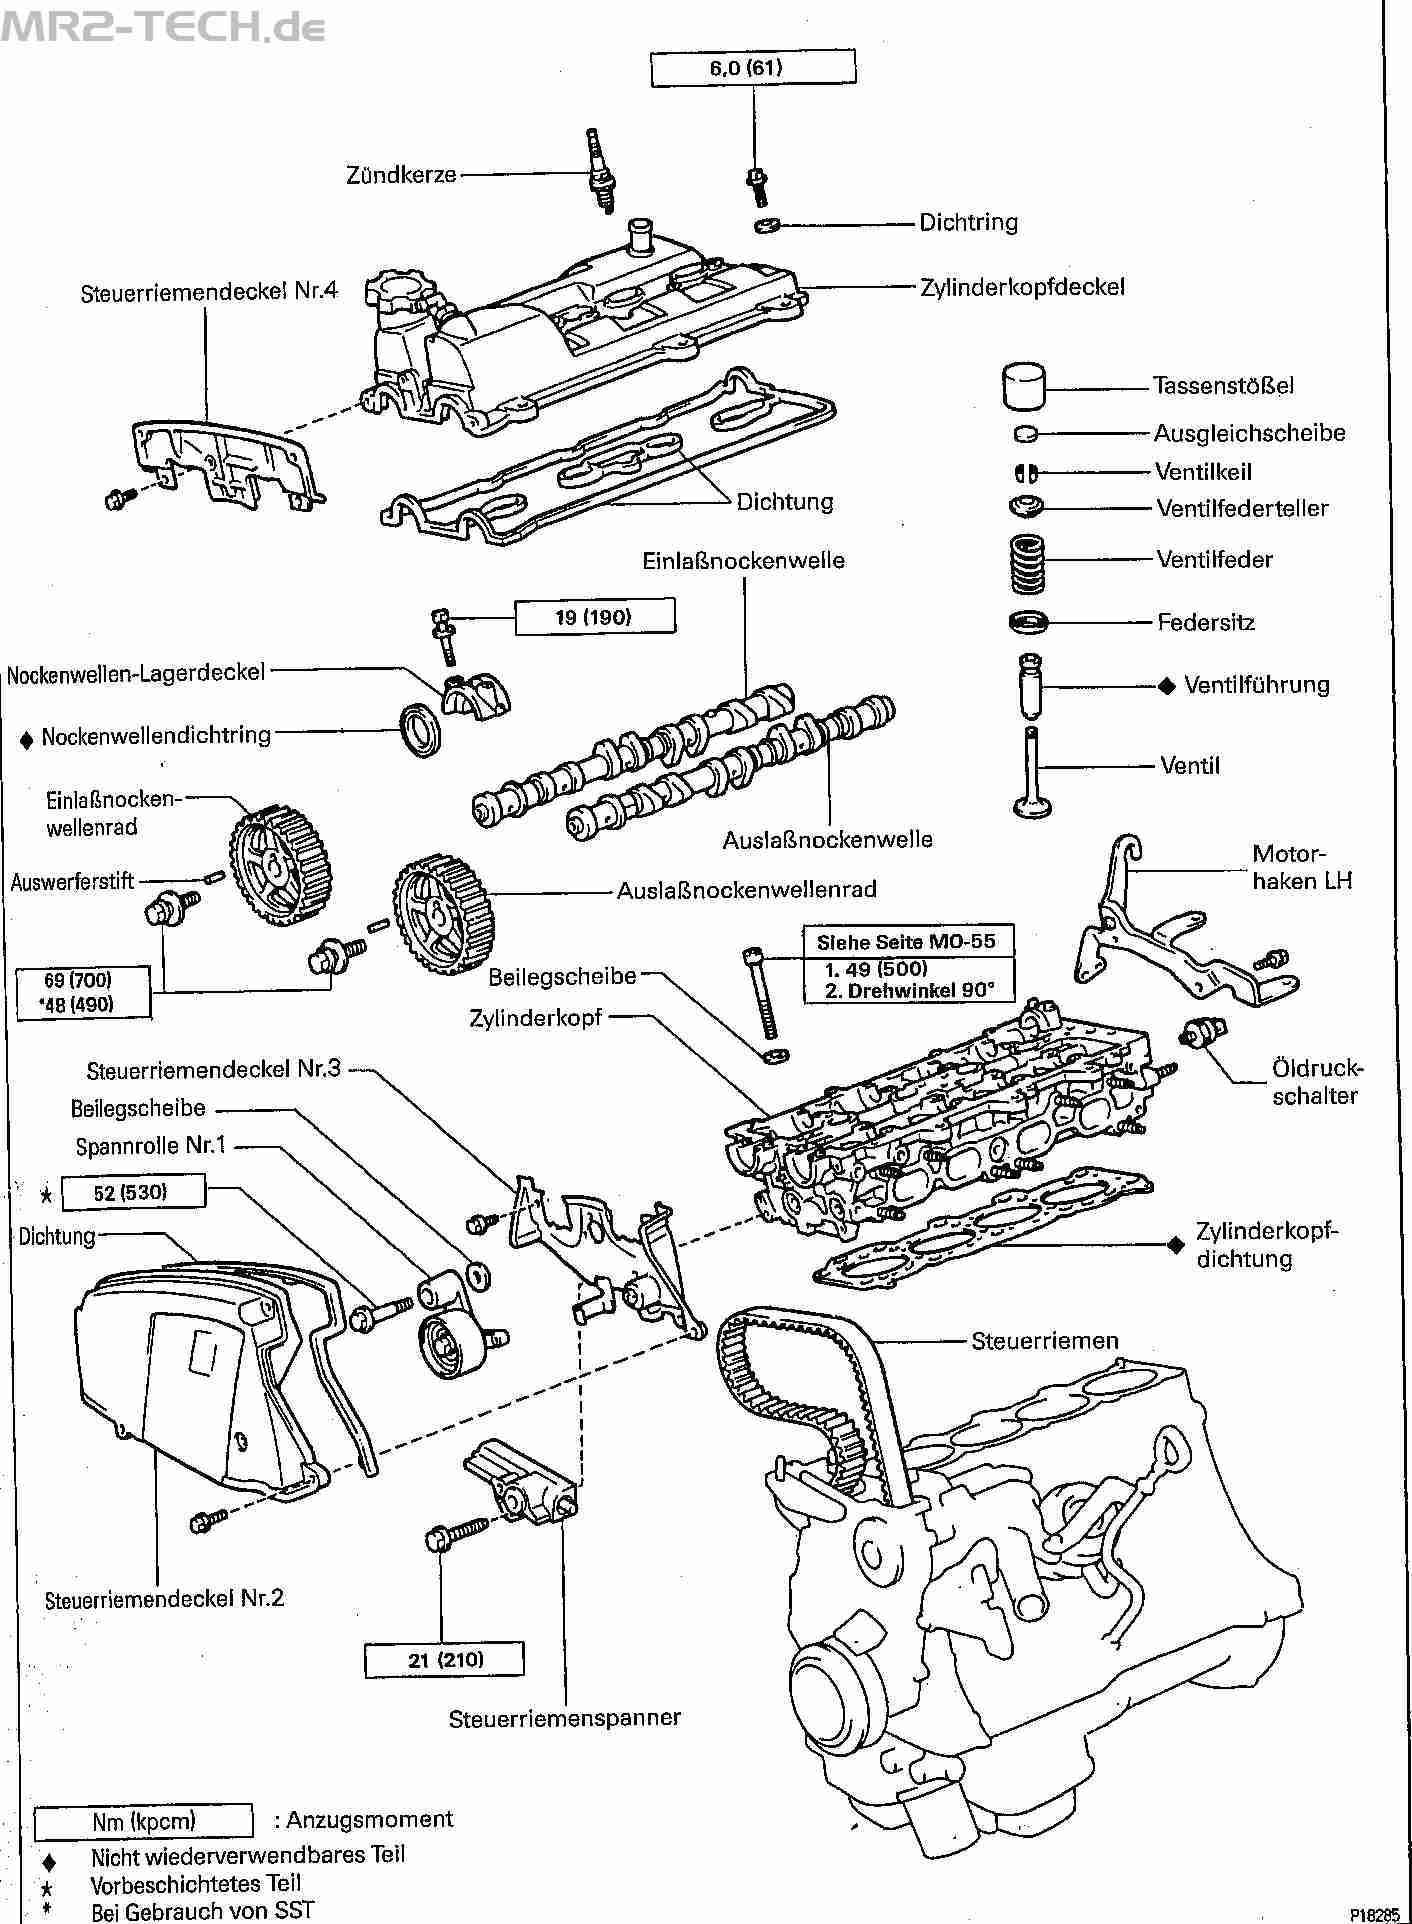 Aufbau Des 500 Hp Motors